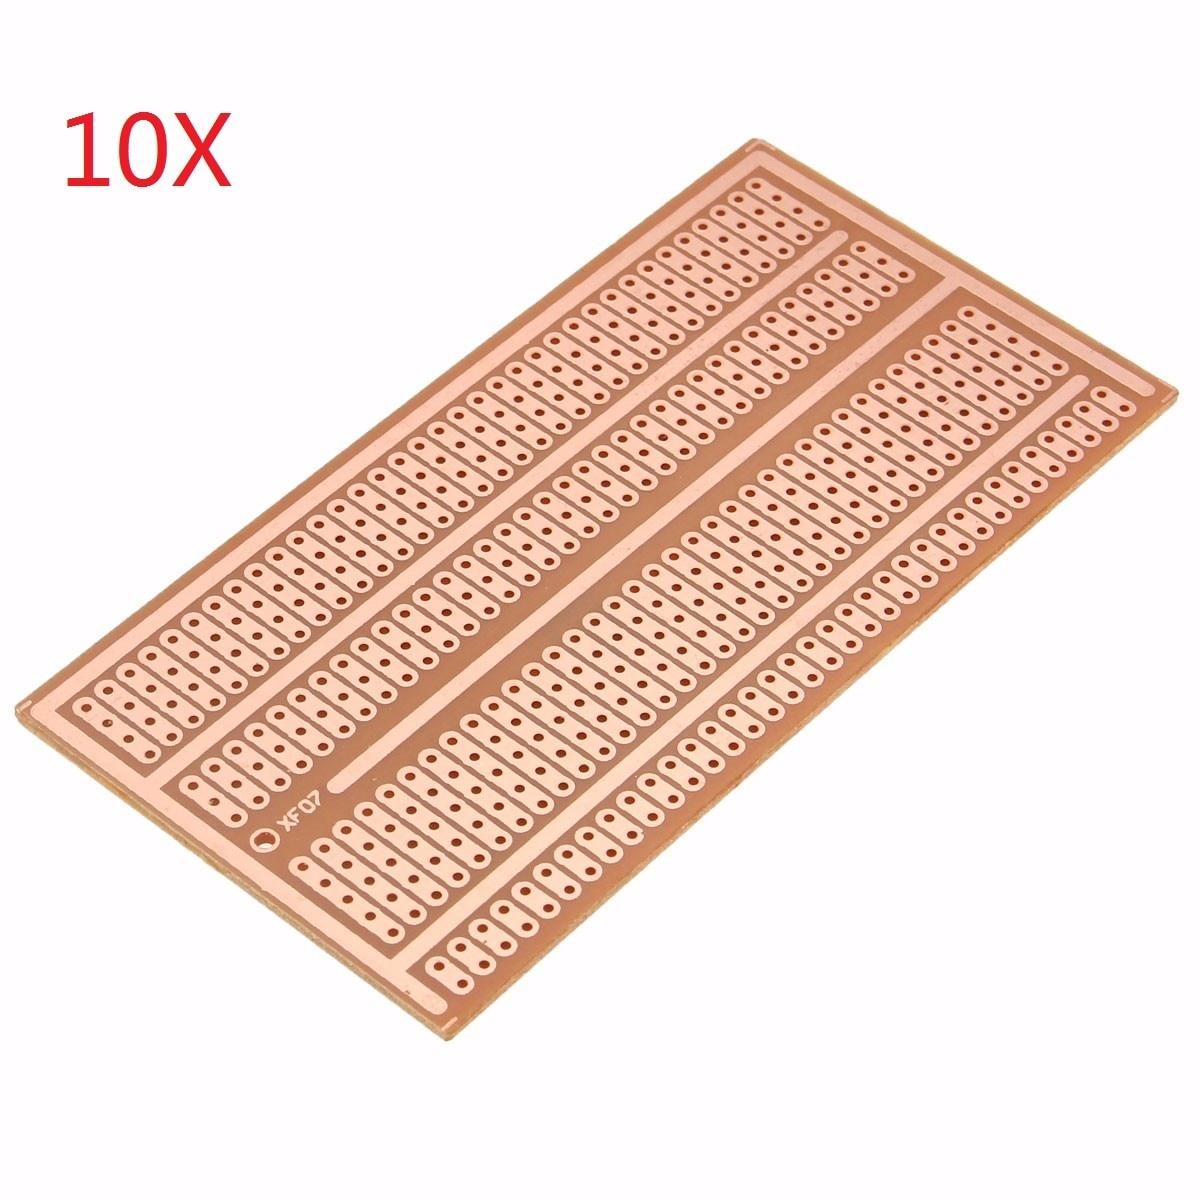 10 Pcs 5x10 centímetros DIY Único Lado De Cobre Placa de Circuito Protótipo de Papel PCB Universal Experiment Breadboard 2- 3-5 buraco conjunta